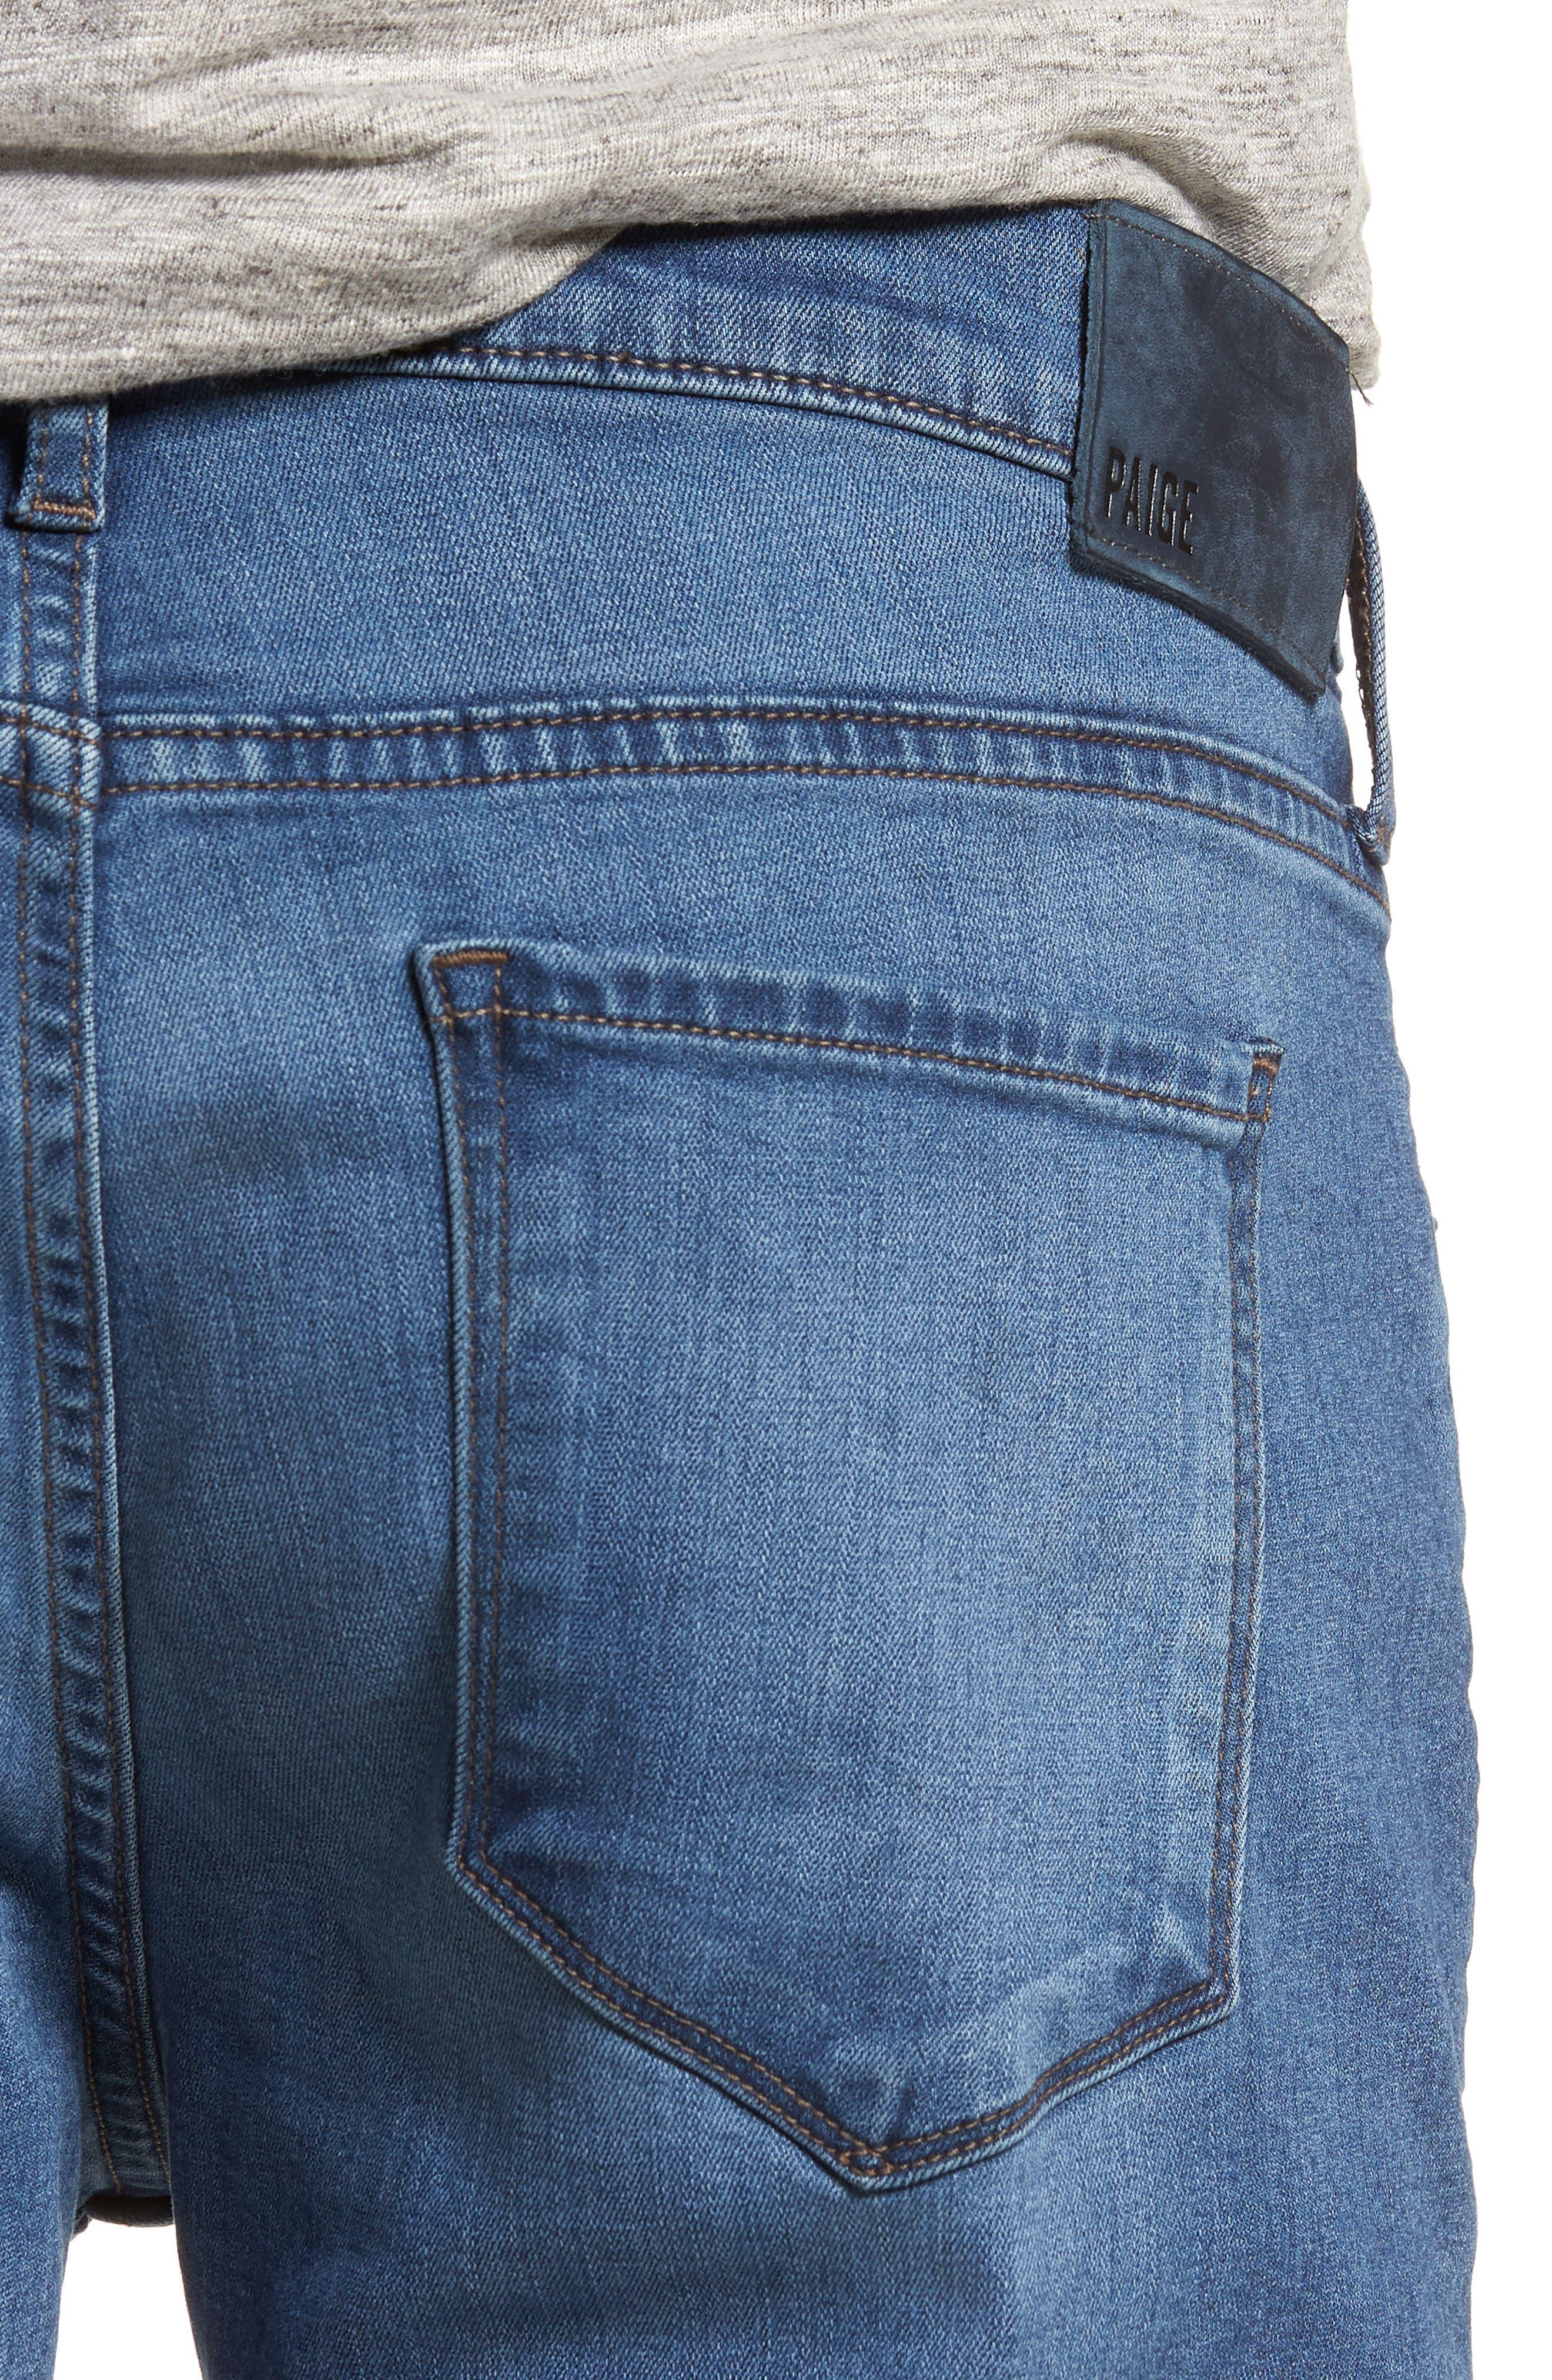 Federal Slim Straight Leg Jeans,                             Alternate thumbnail 4, color,